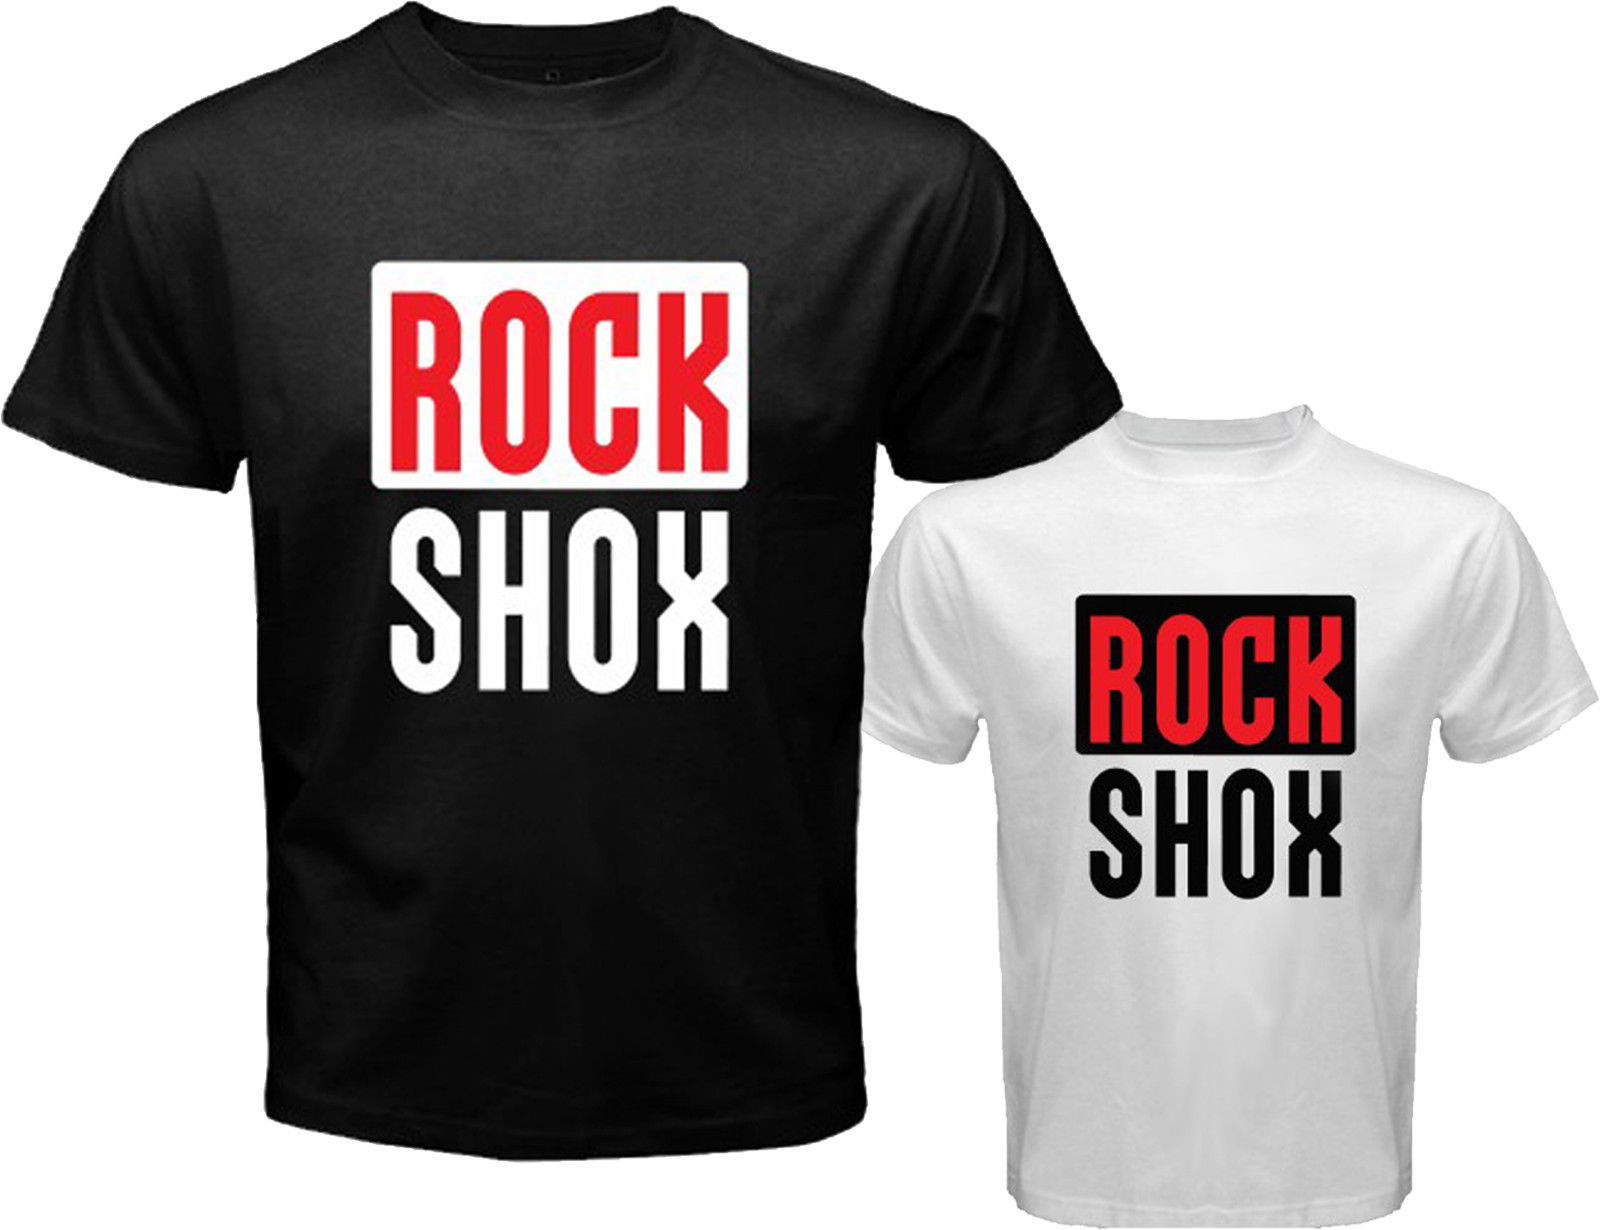 Design t shirts logo - Aliexpress Com Buy 2017 New Arrivals Men S Rock Shox Logo Moutain Mtb Biker Bicycle Design T Shirt Hot Sales Tops Who Printed Short Sleeve Tees From